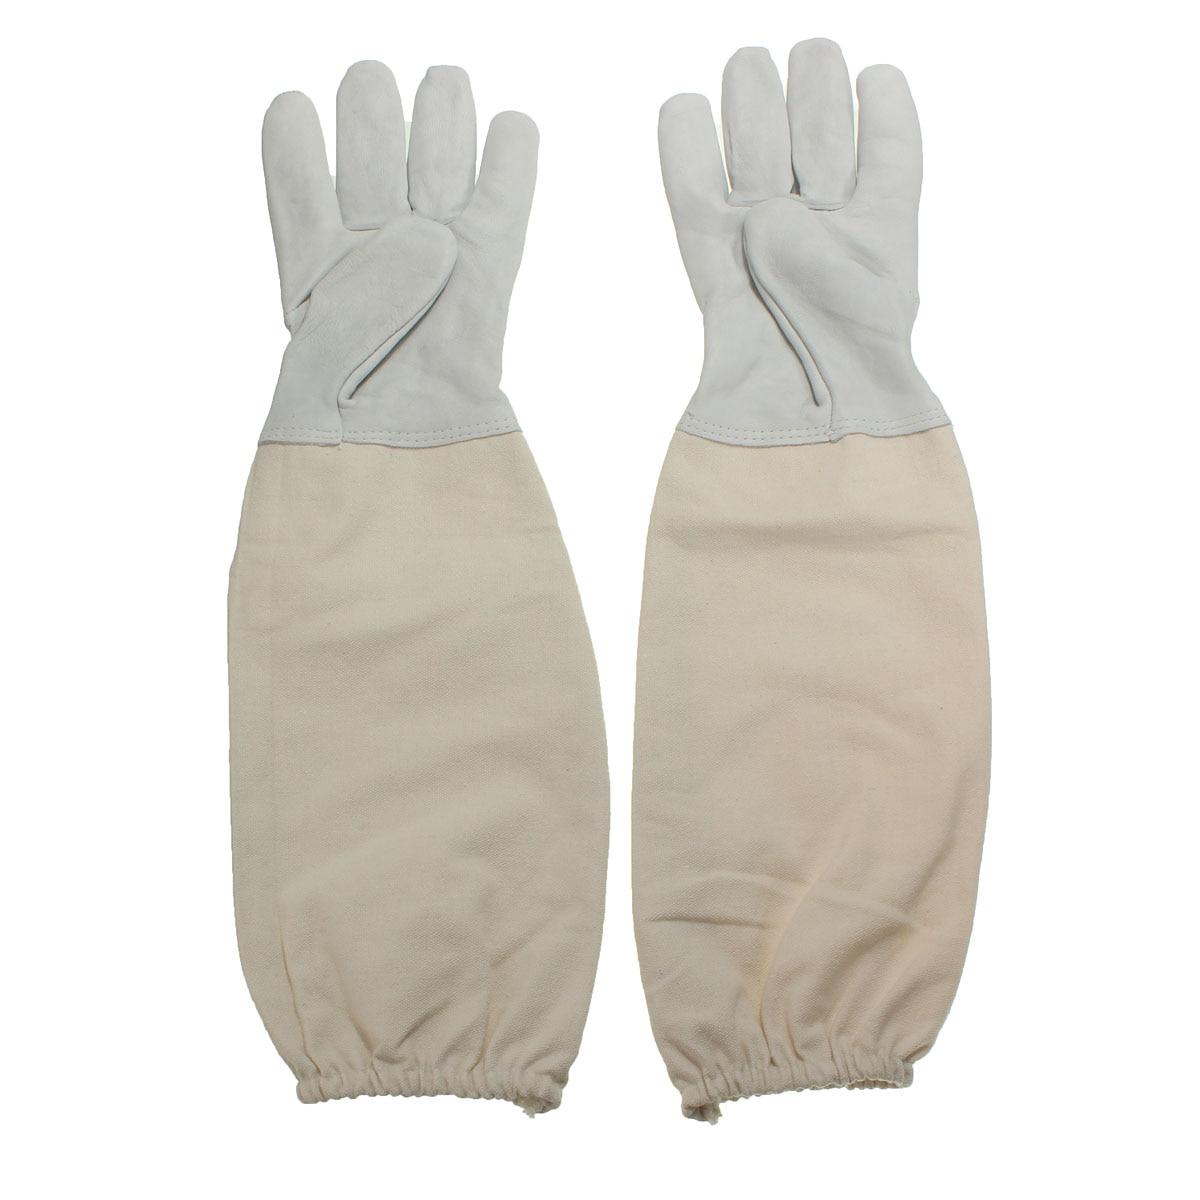 1 Pair Beekeeping Goatskin Cape Gloves XL Sheepskin W/ Vented Long Sleeves Guard New Arrival комплектующие для кормушек beekeeping 4 equipment121mm 91 158